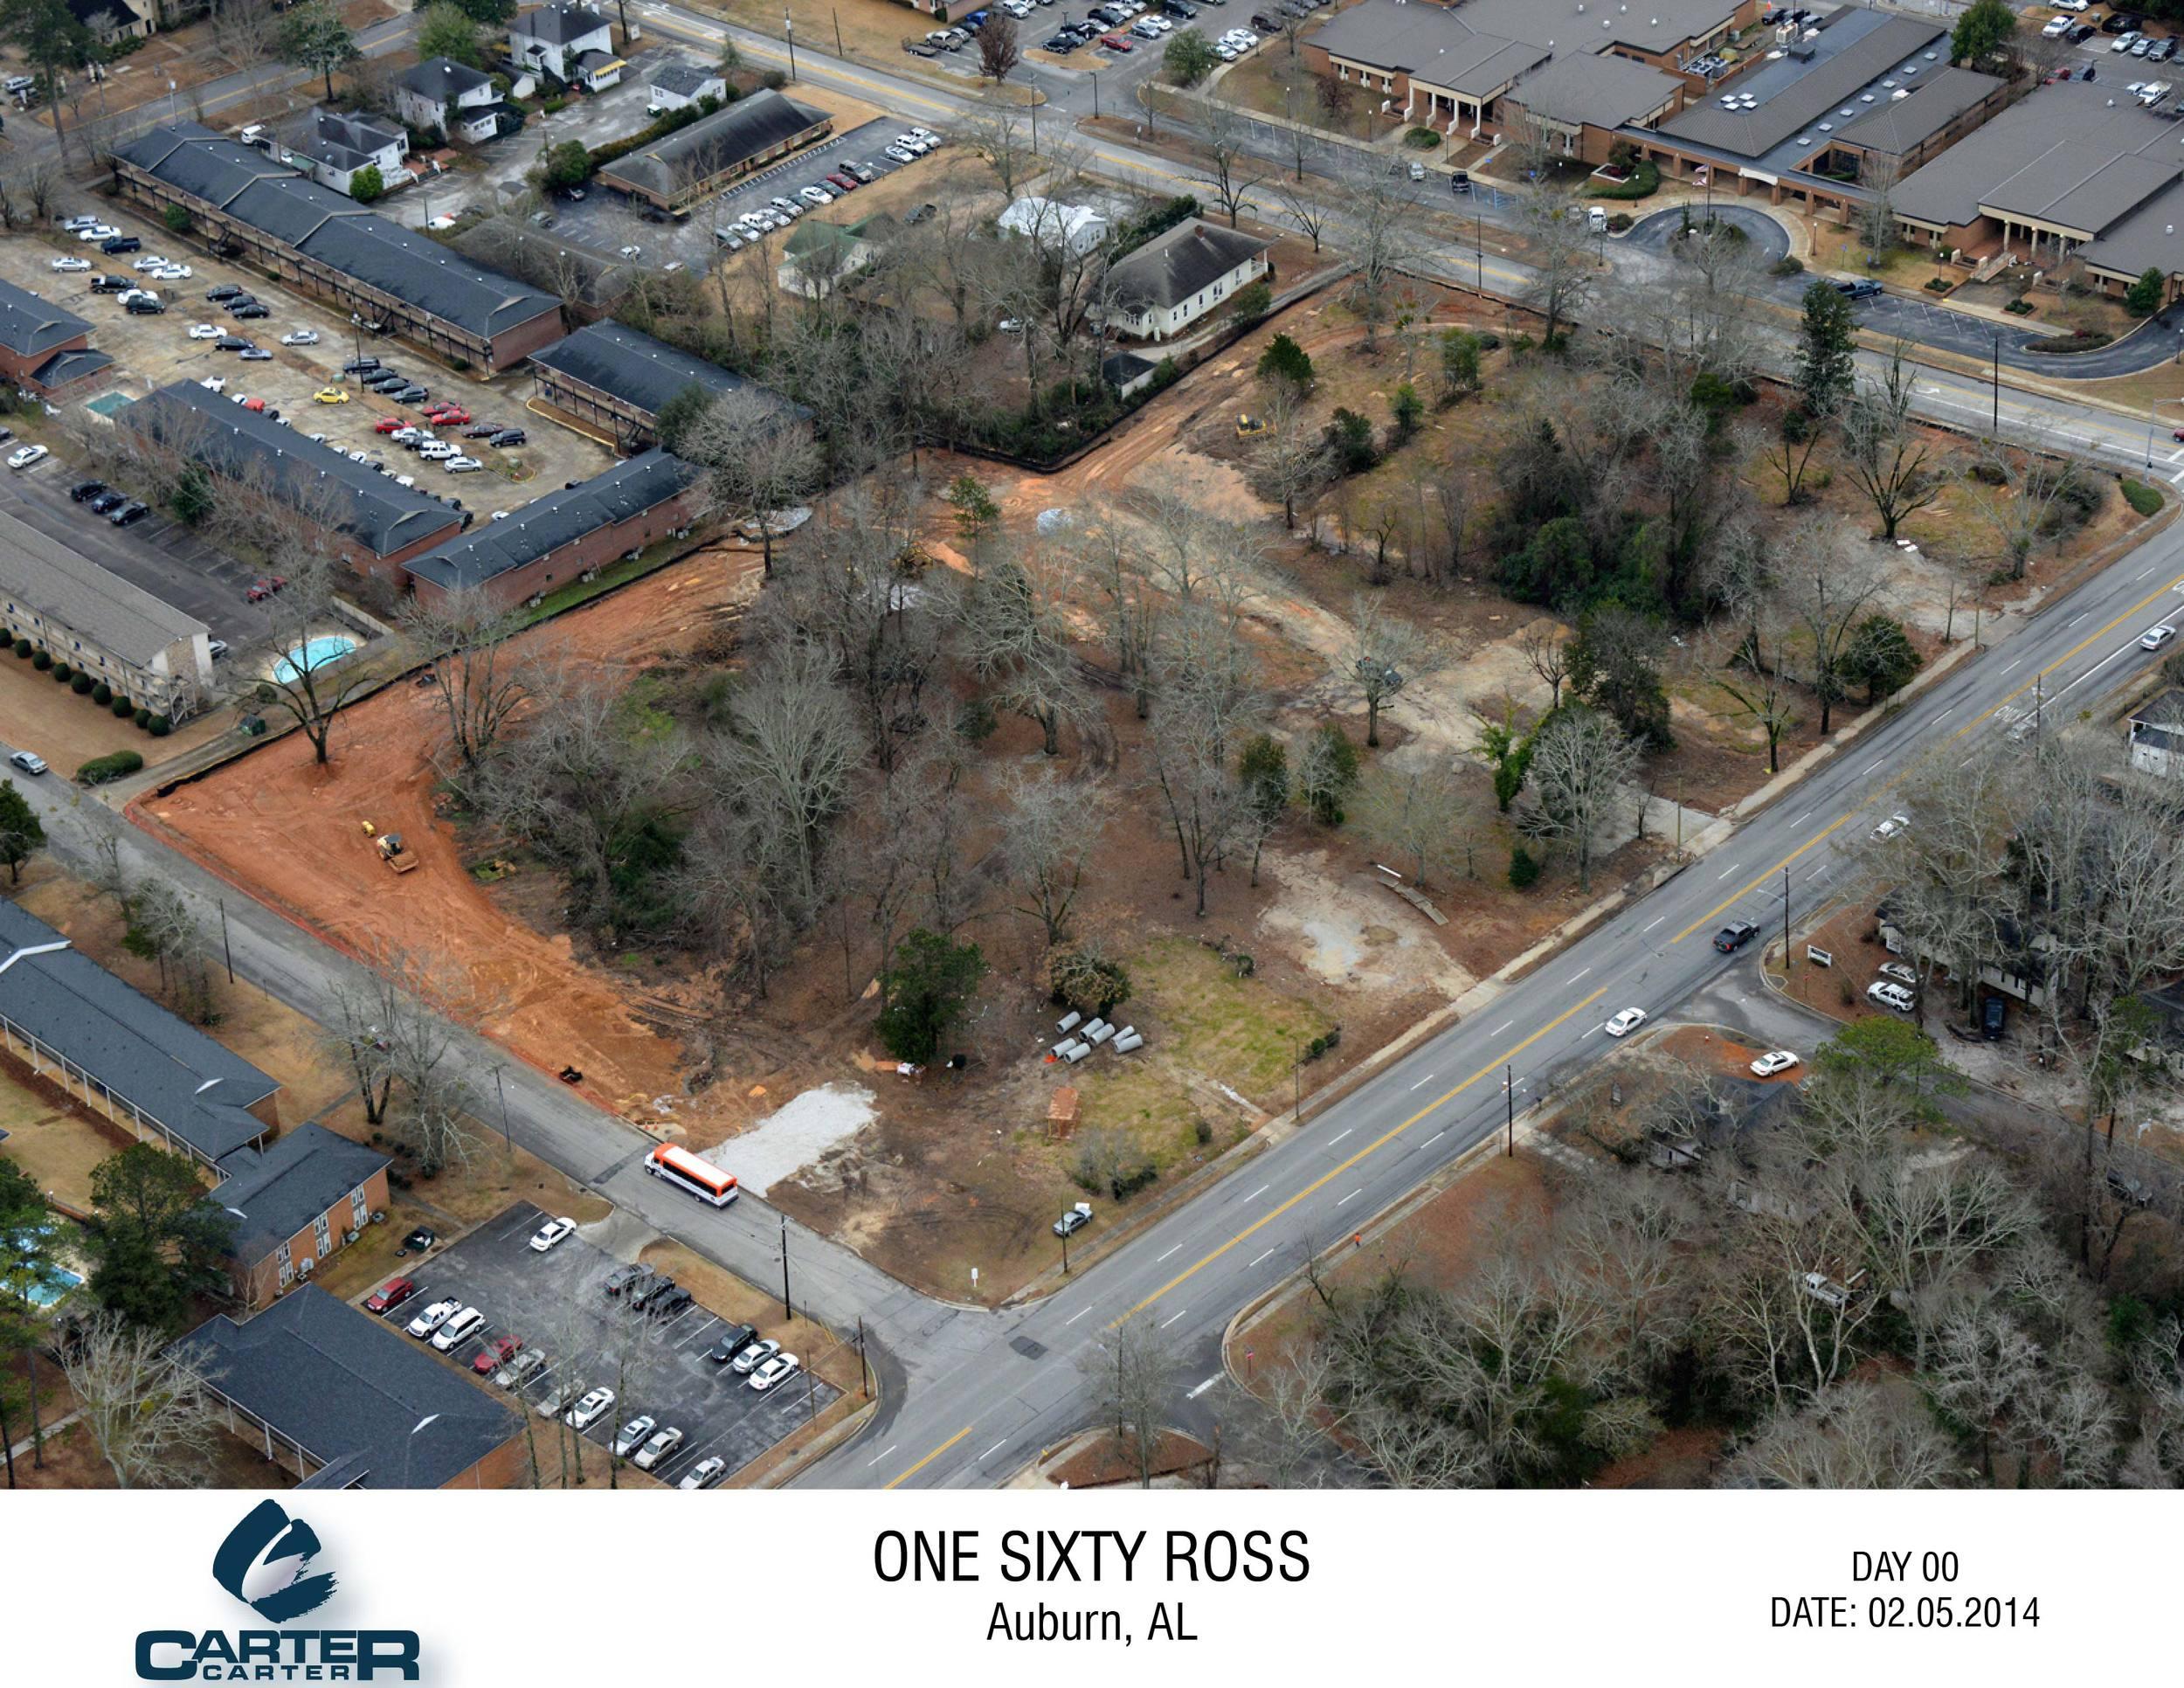 One Sixty Ross 1402050051-CC.jpg